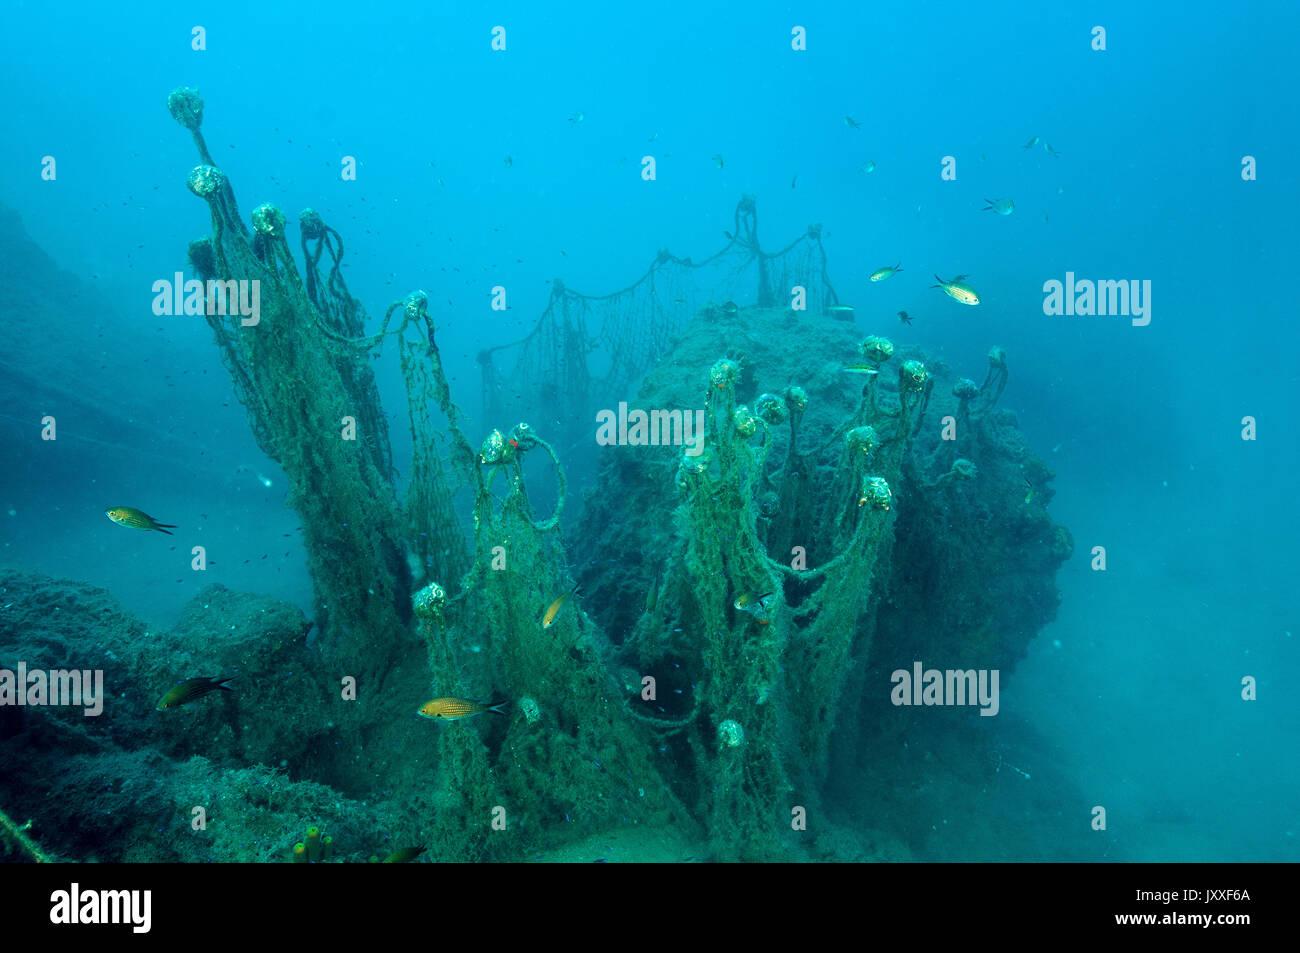 Ghost Netze, verloren gegangene Fanggeräte in Gökova Marine Protected Area Türkei Stockbild